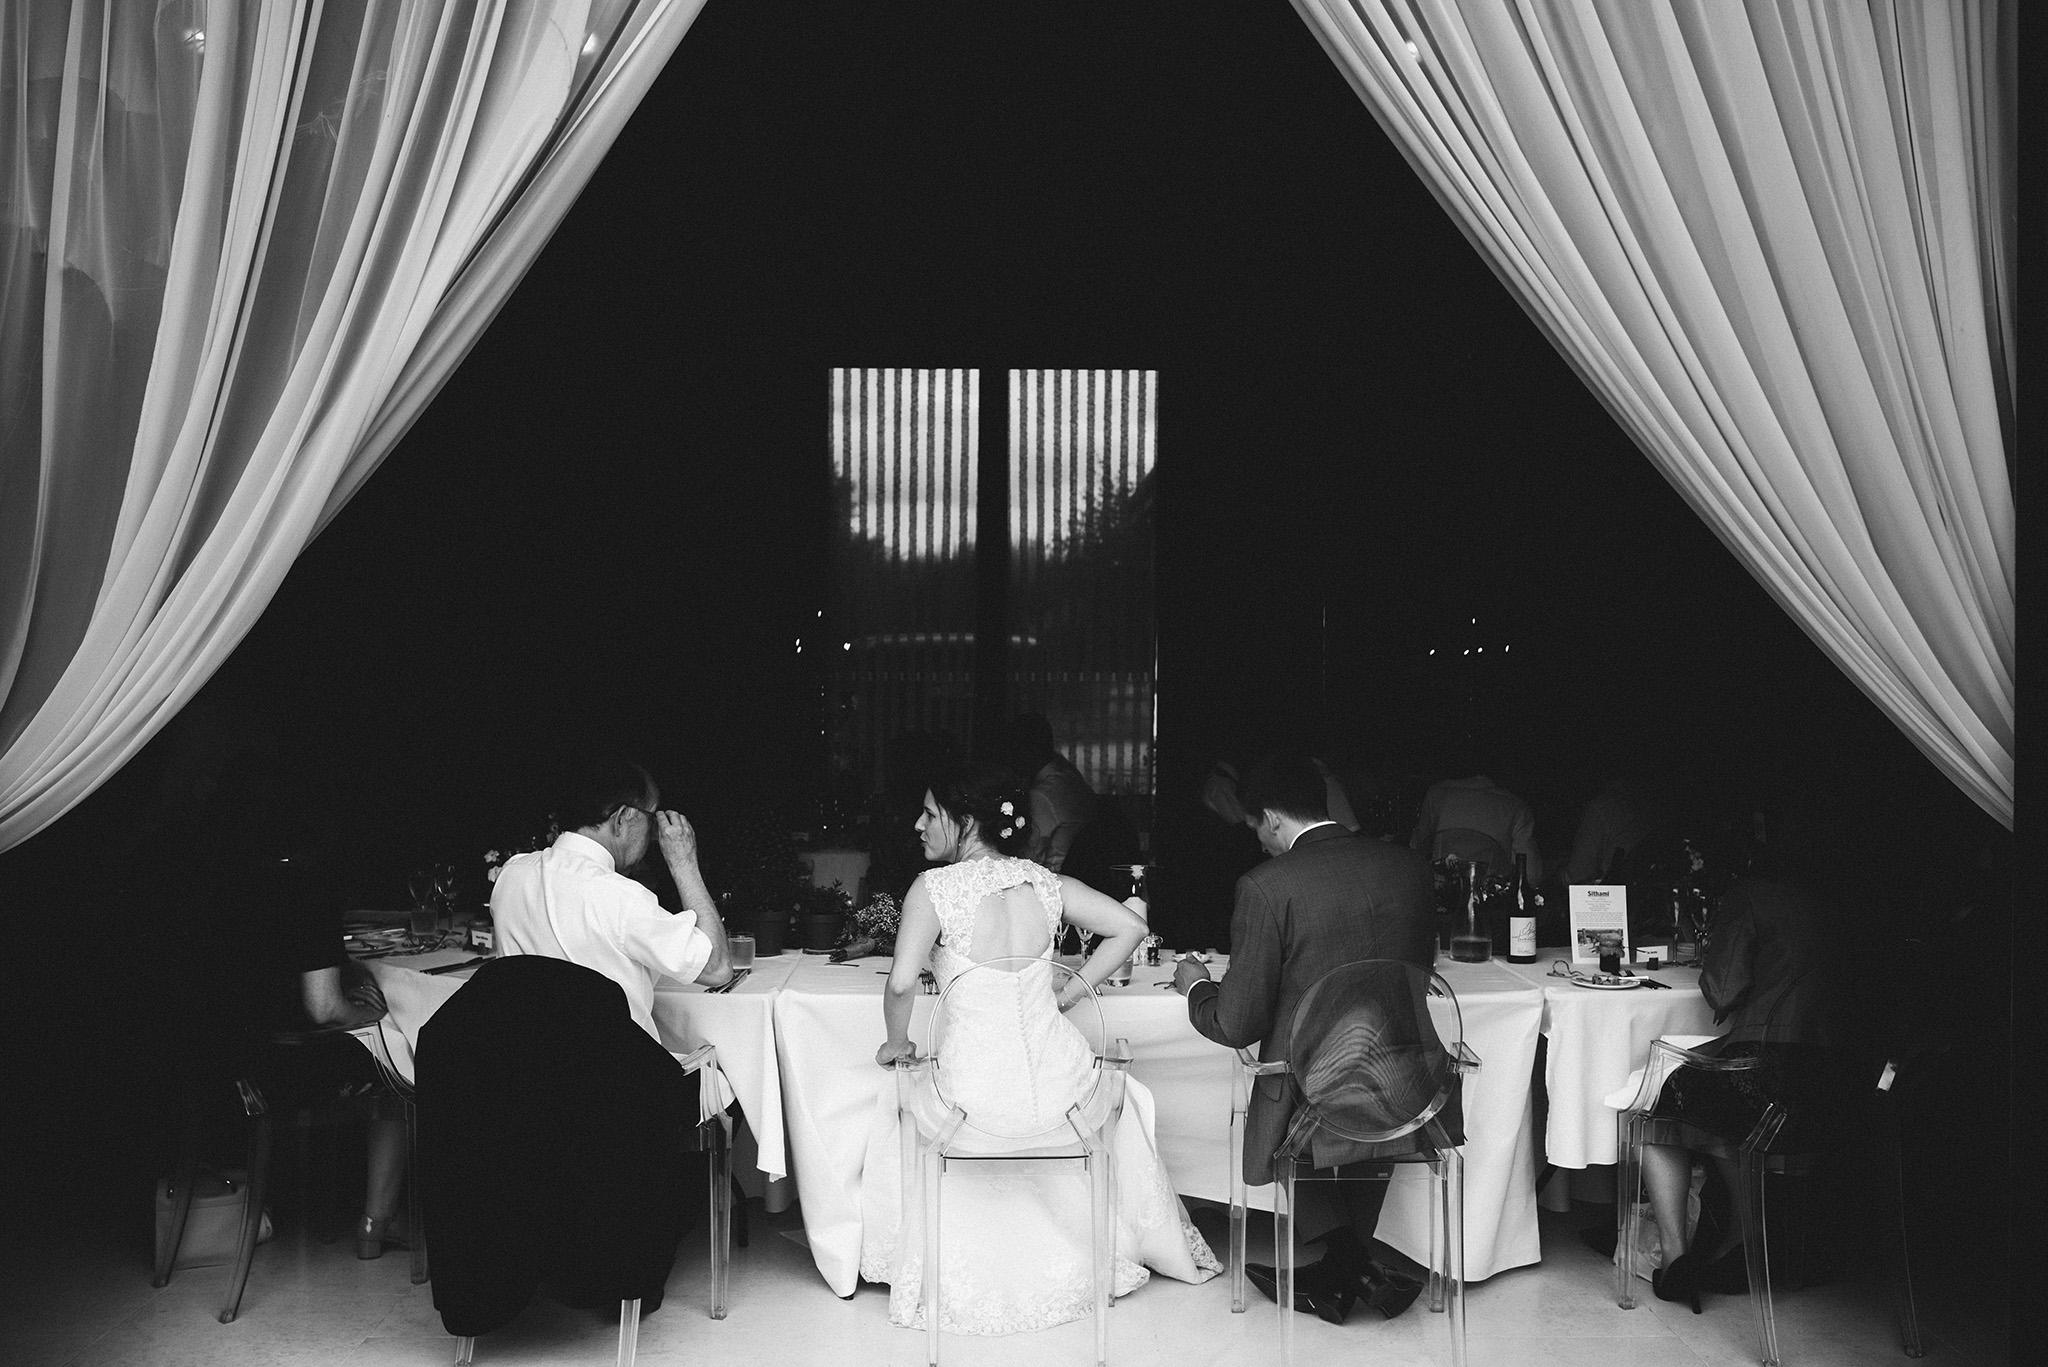 scott-stockwell-photography-wedding-26.jpg